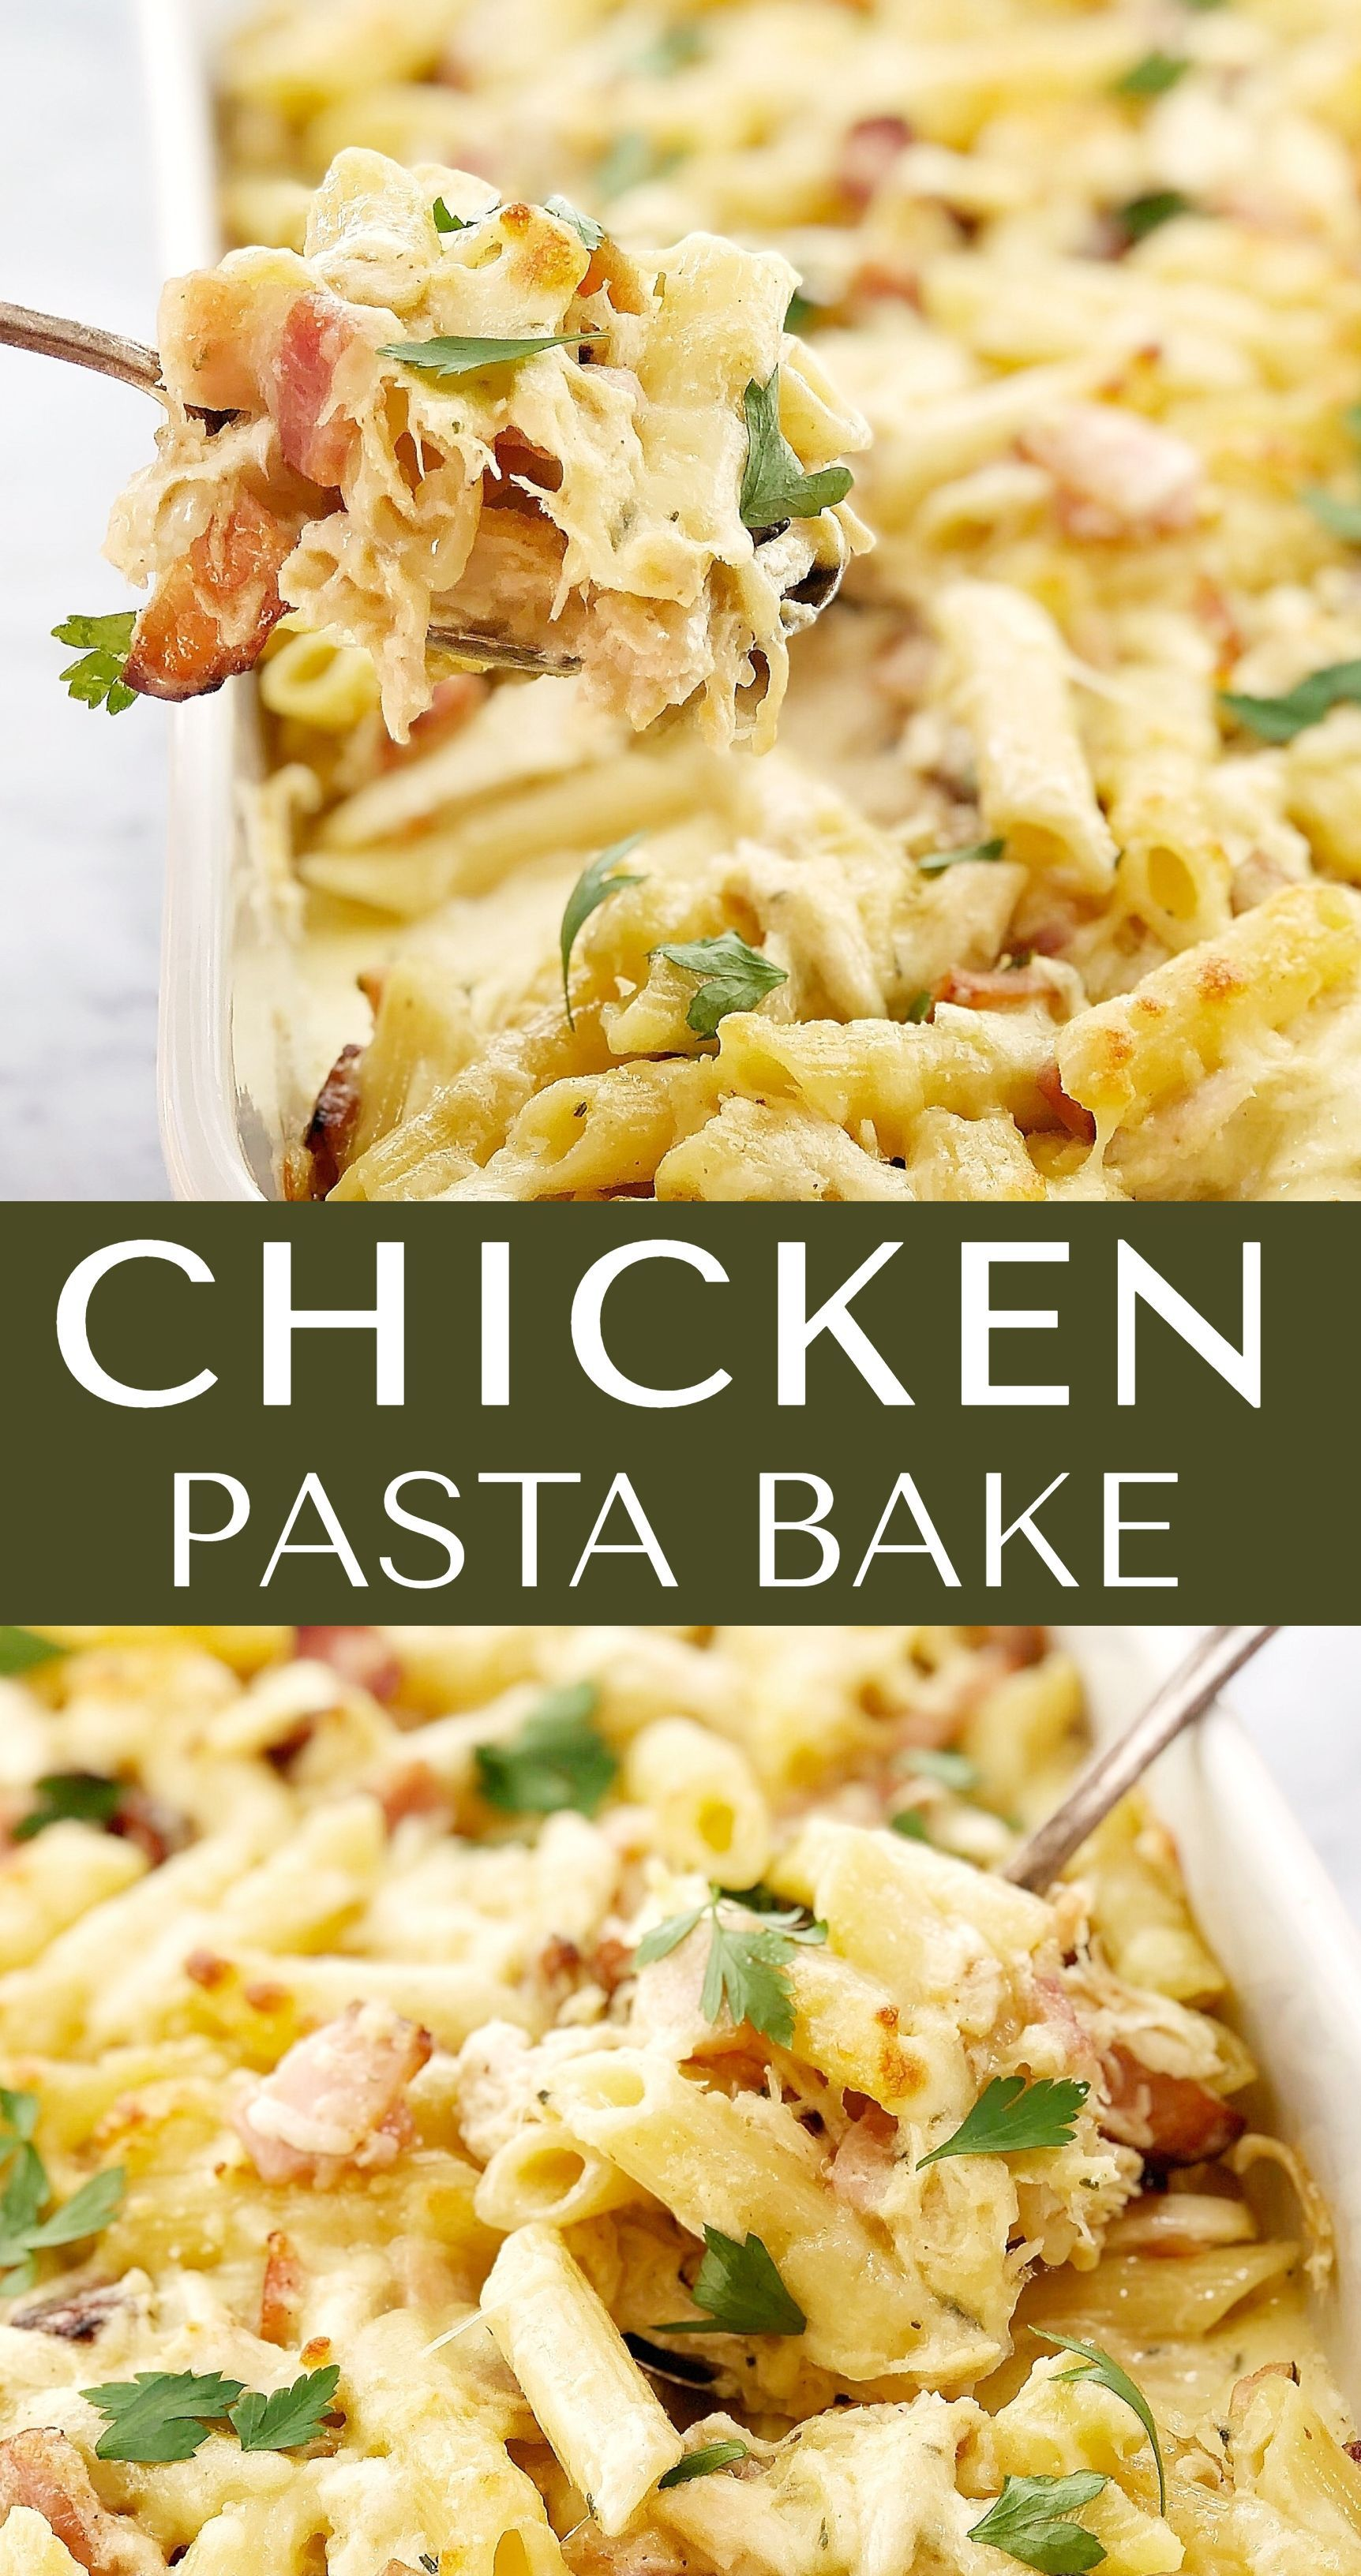 Easy Creamy Chicken Pasta Bake Chef Not Required Recipe Creamy Chicken Pasta Recipes Using Rotisserie Chicken Chicken Pasta Bake